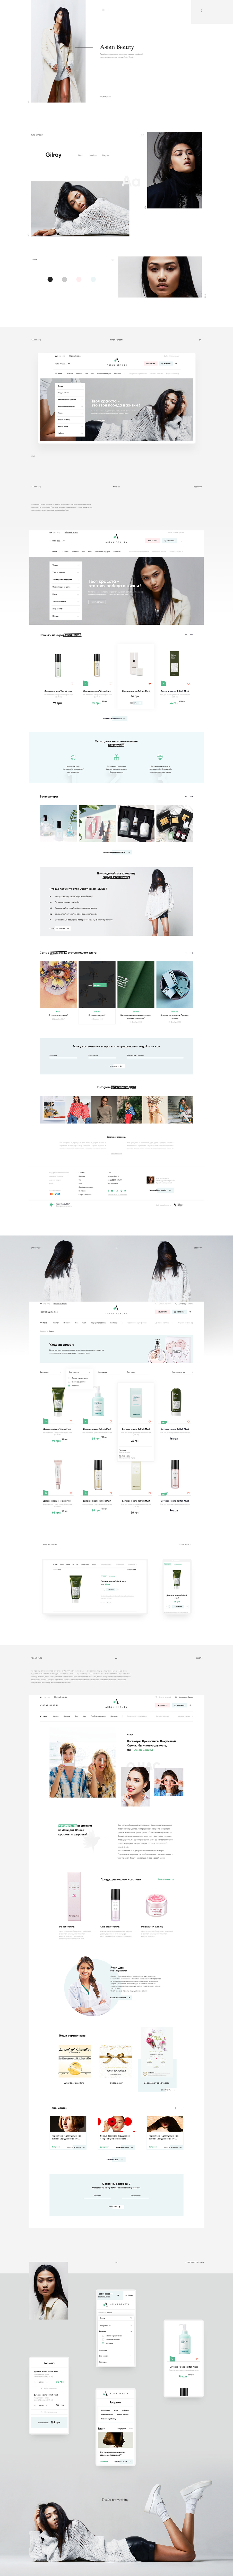 asianbeauty asian wsf design ux UI Web